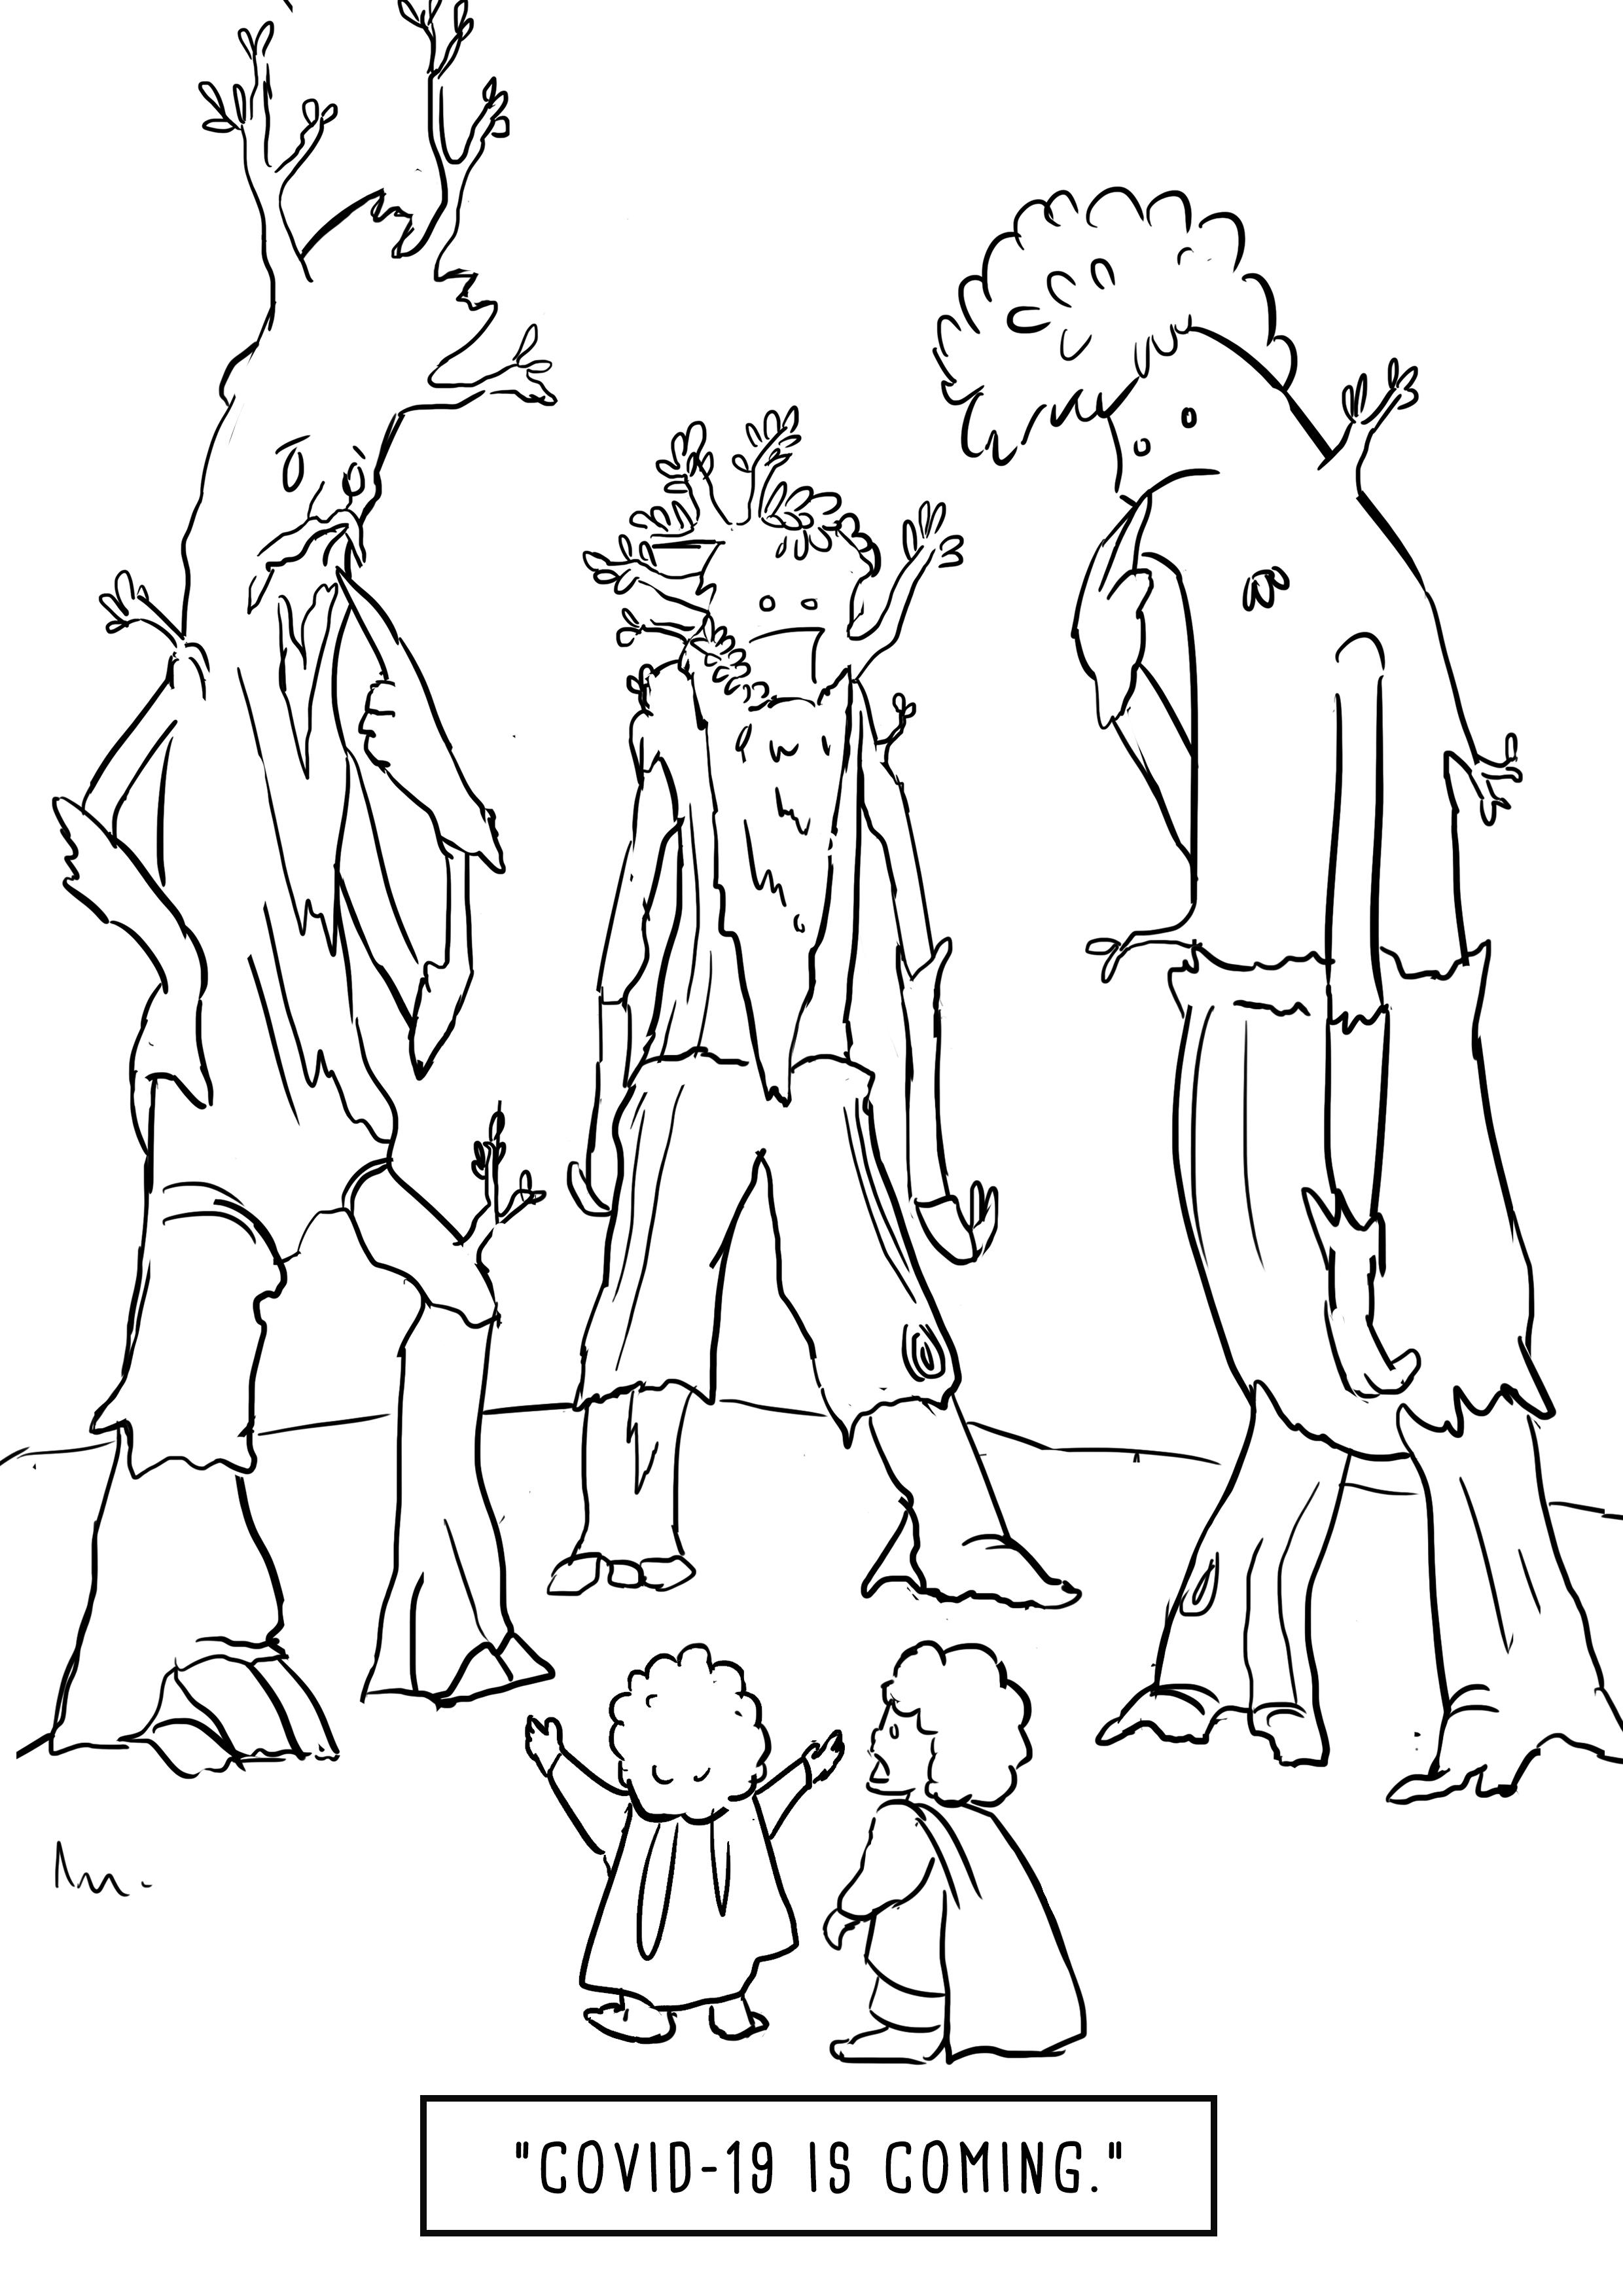 Ent Moot Corona Virus Covid 19 Hobbits